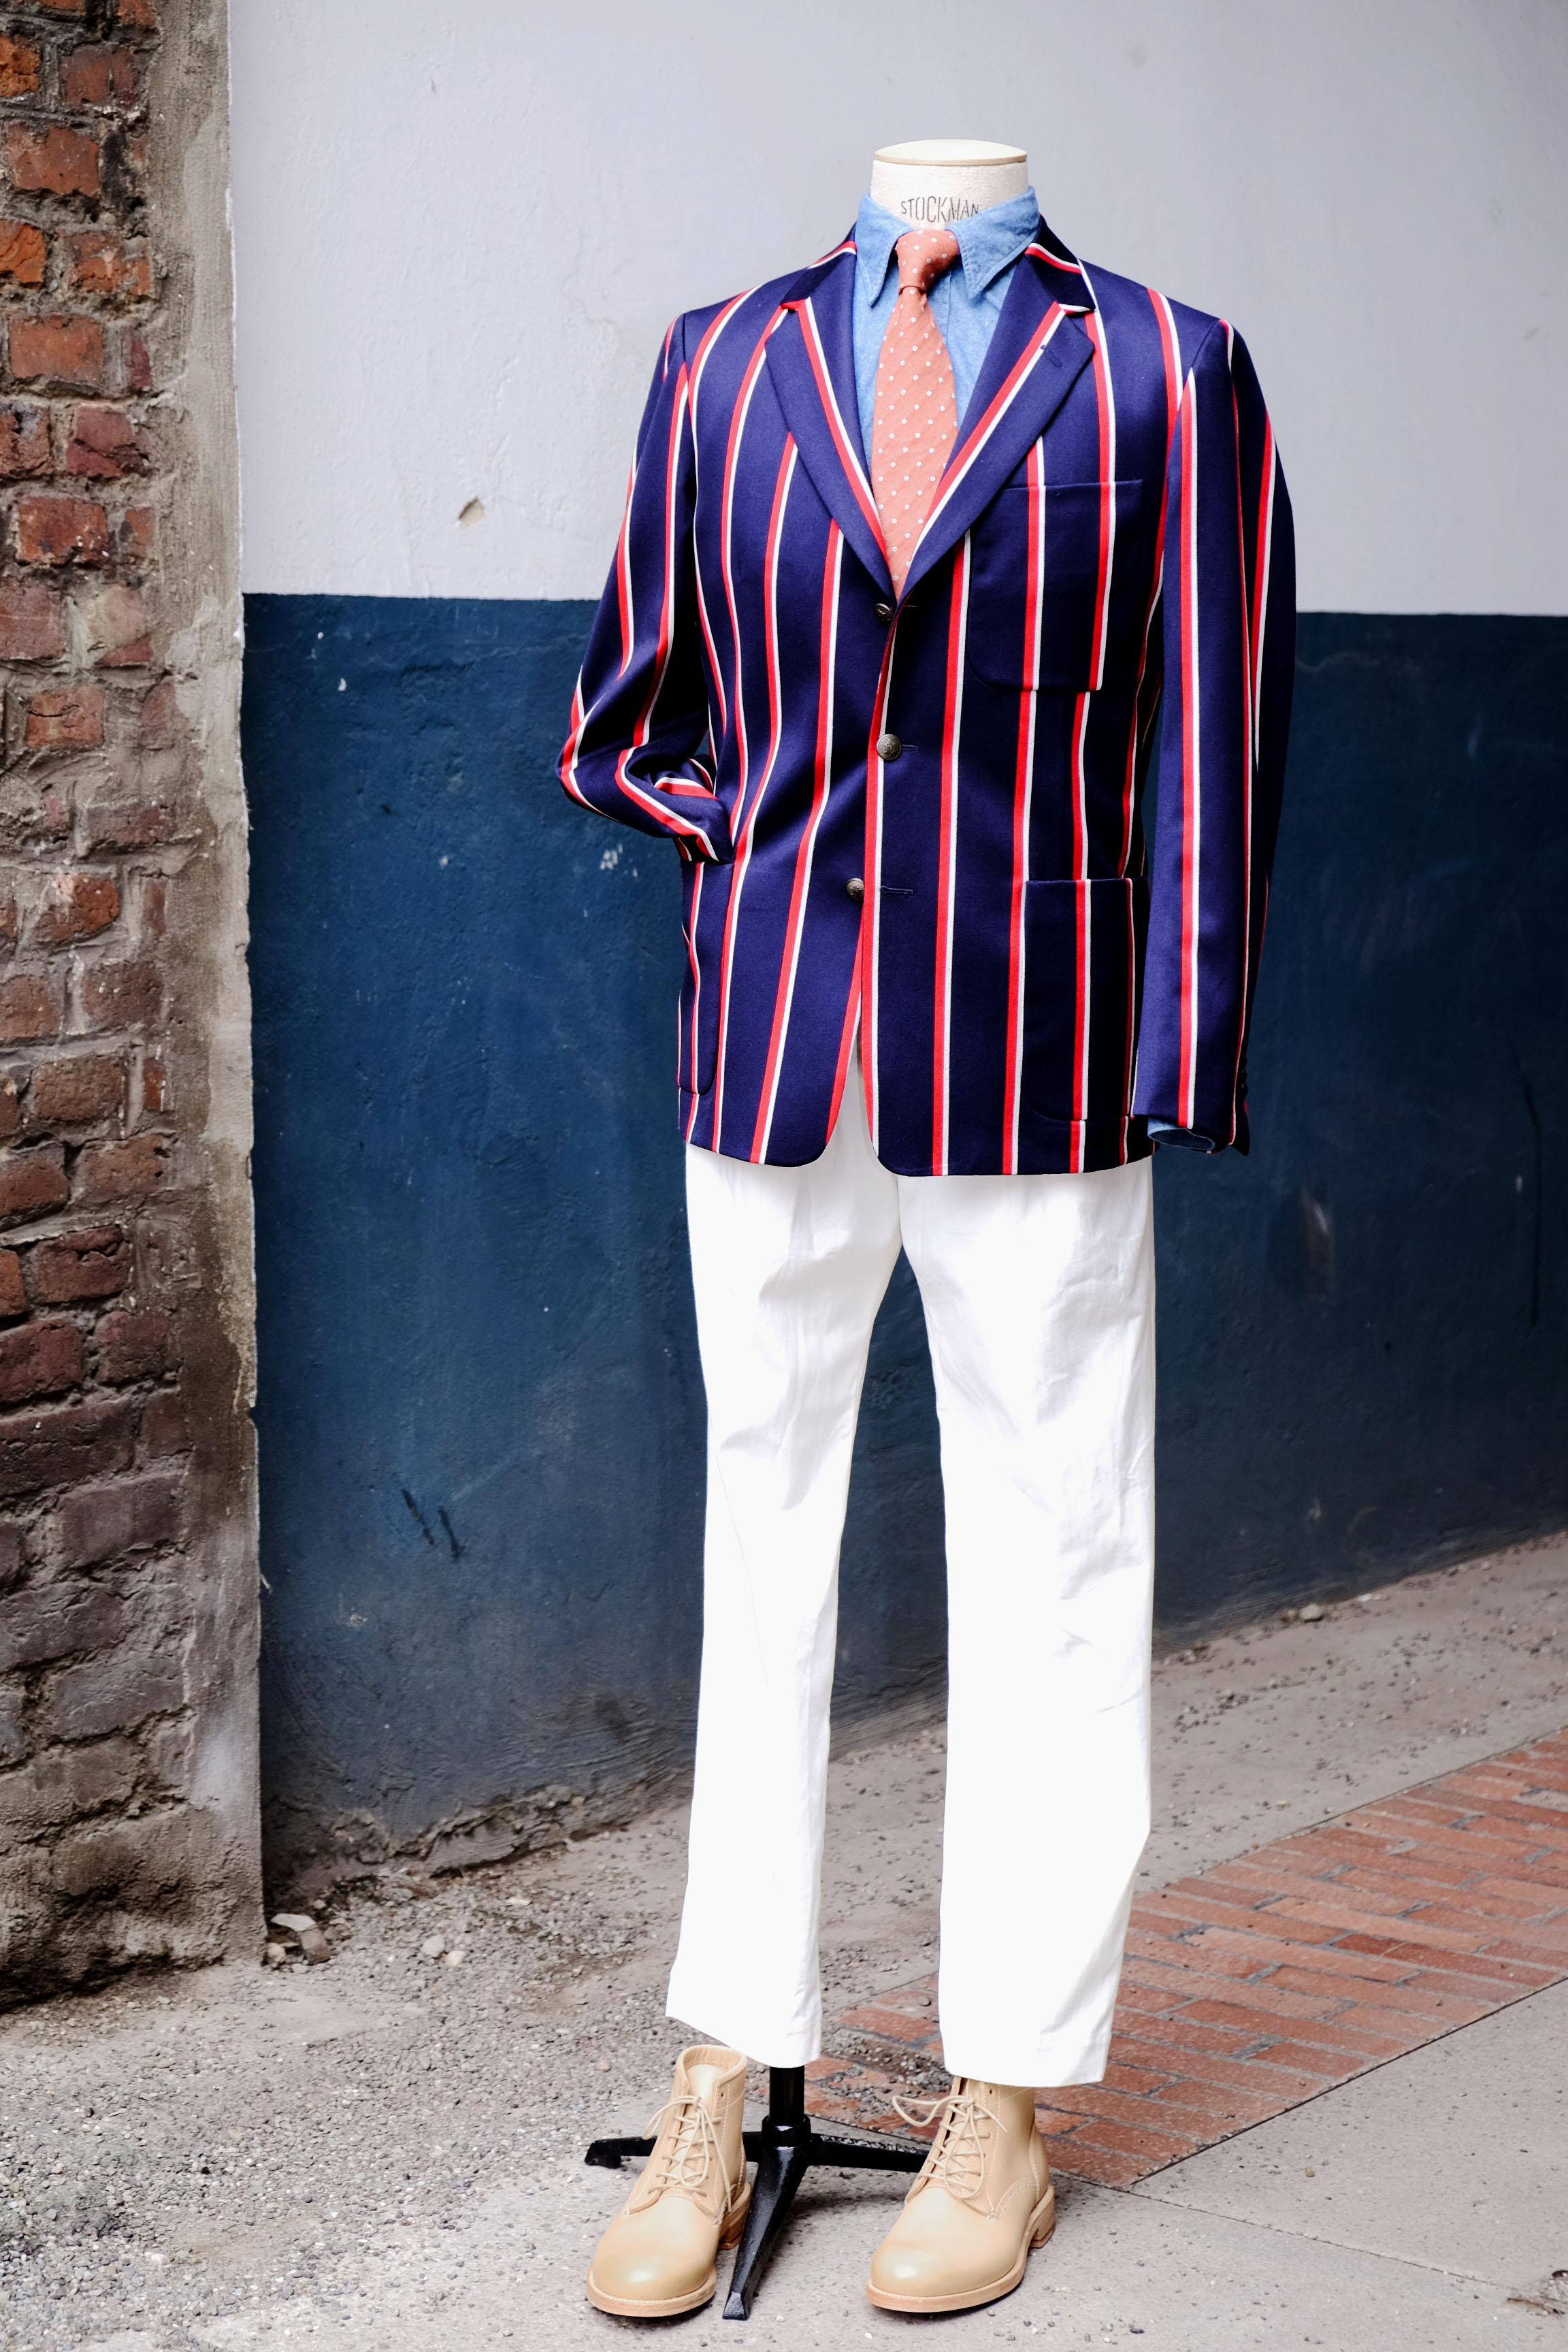 outfit-clubsakko-tommypage-kennethfield-broska-chambrayhemd-01